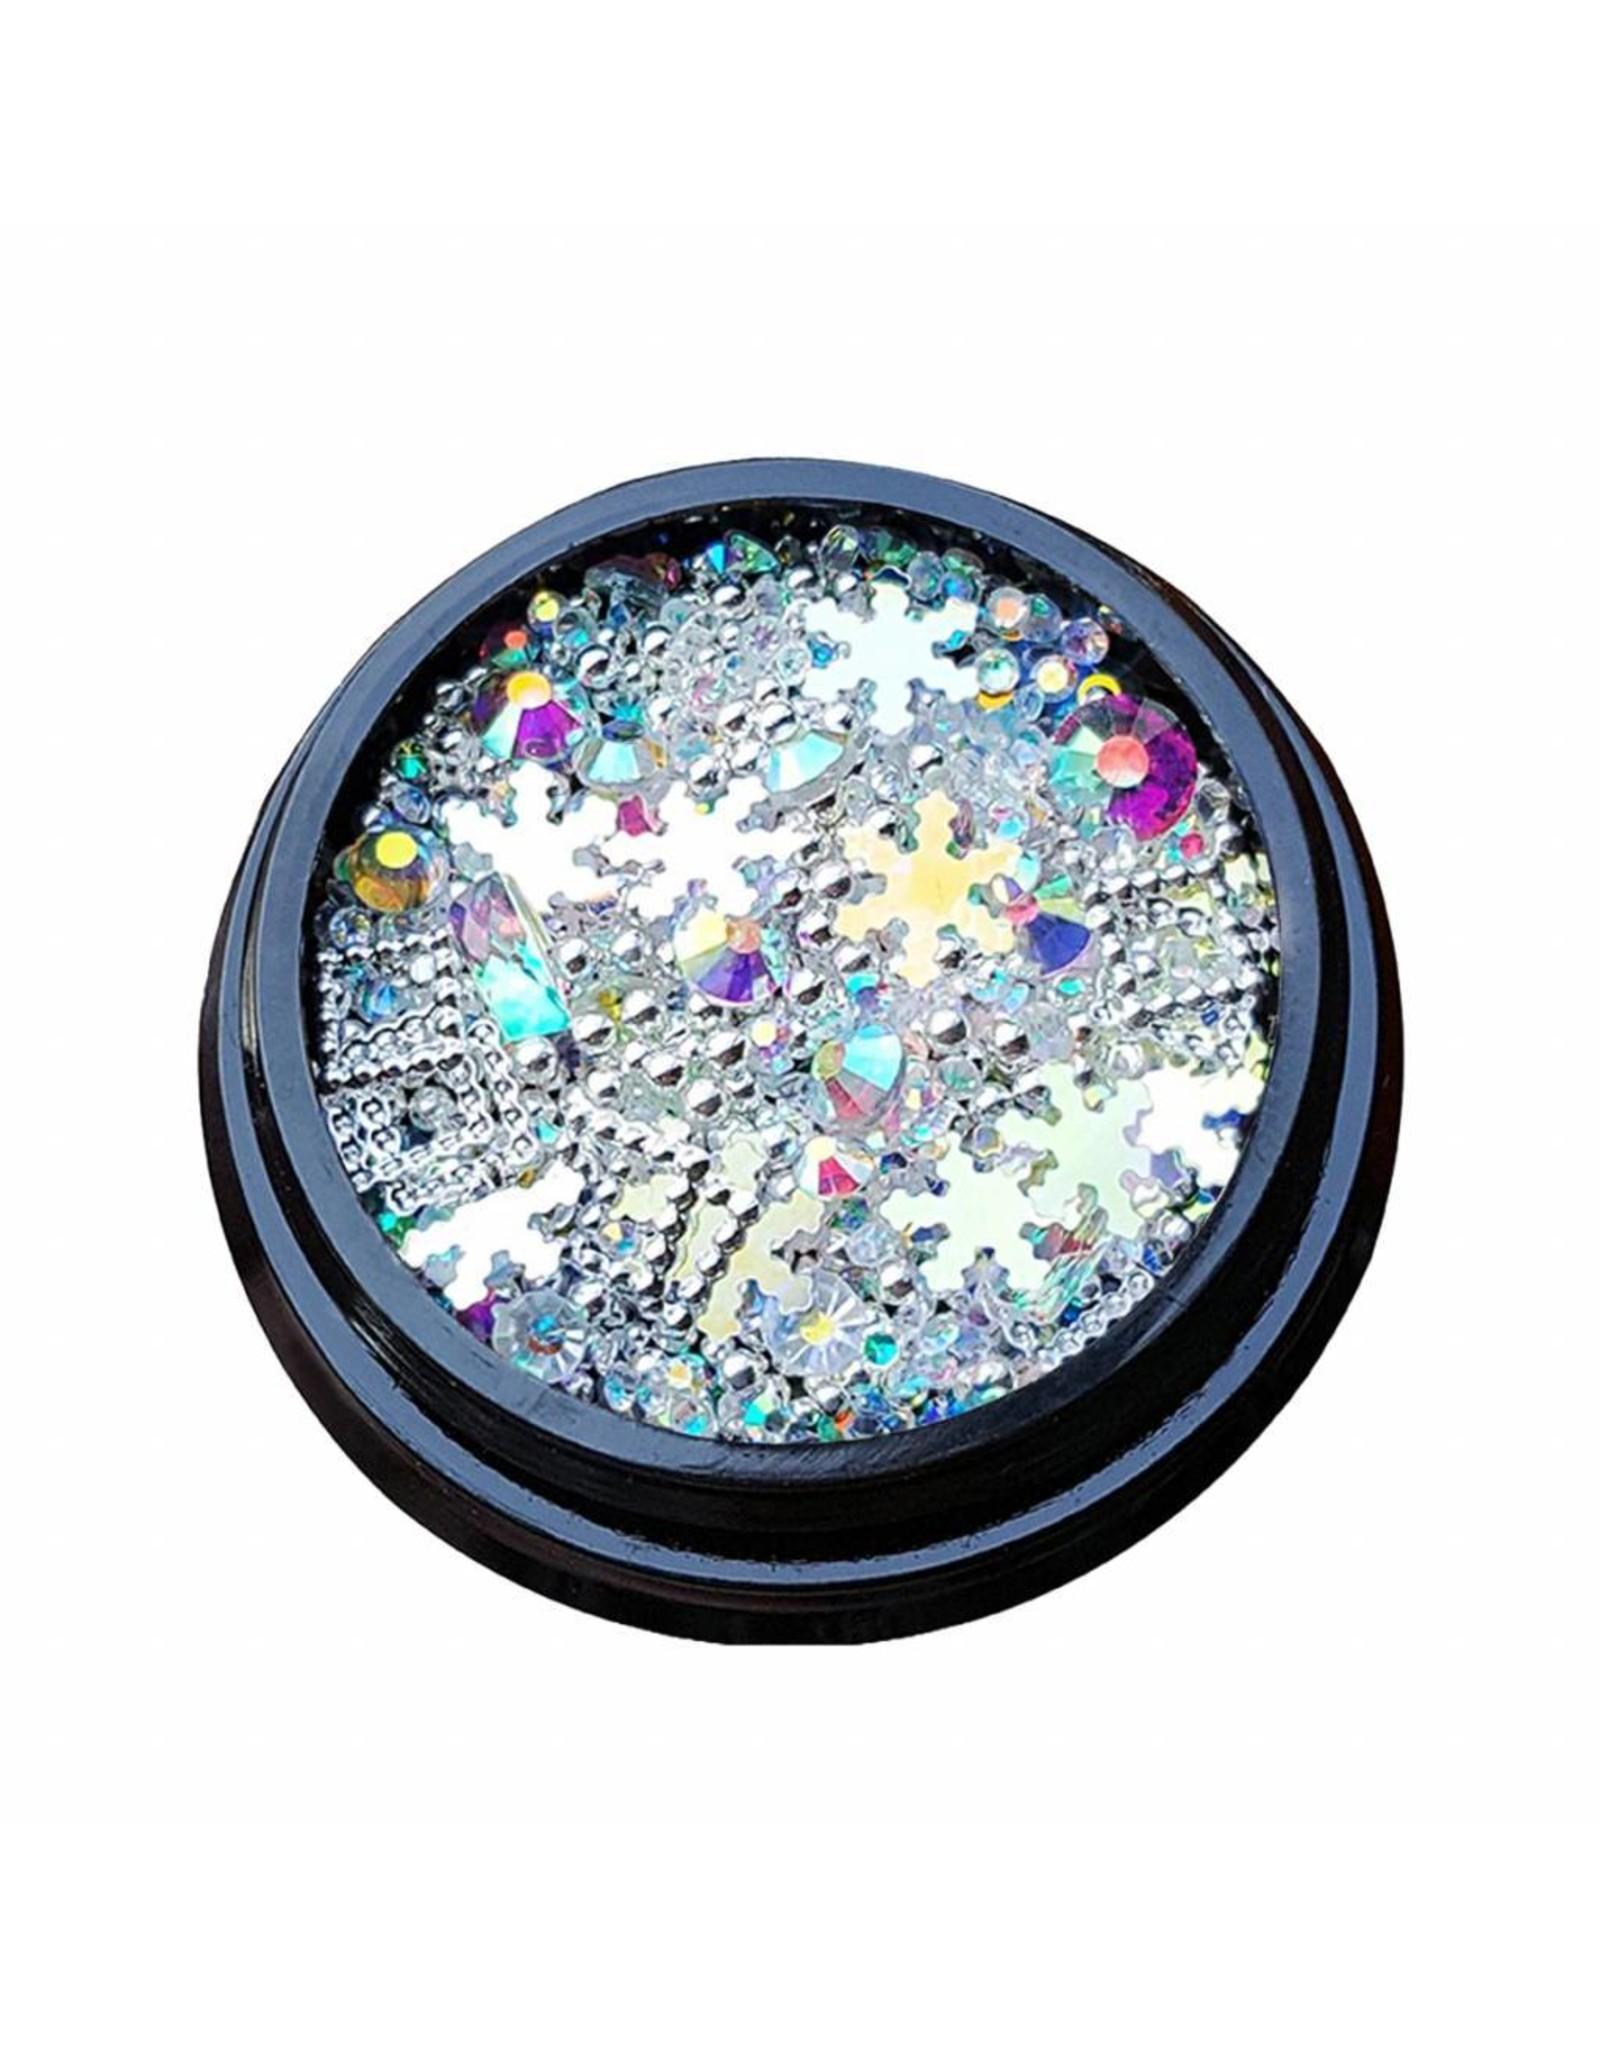 Merkloos 3D Mix of luxurious jewelry  (07)